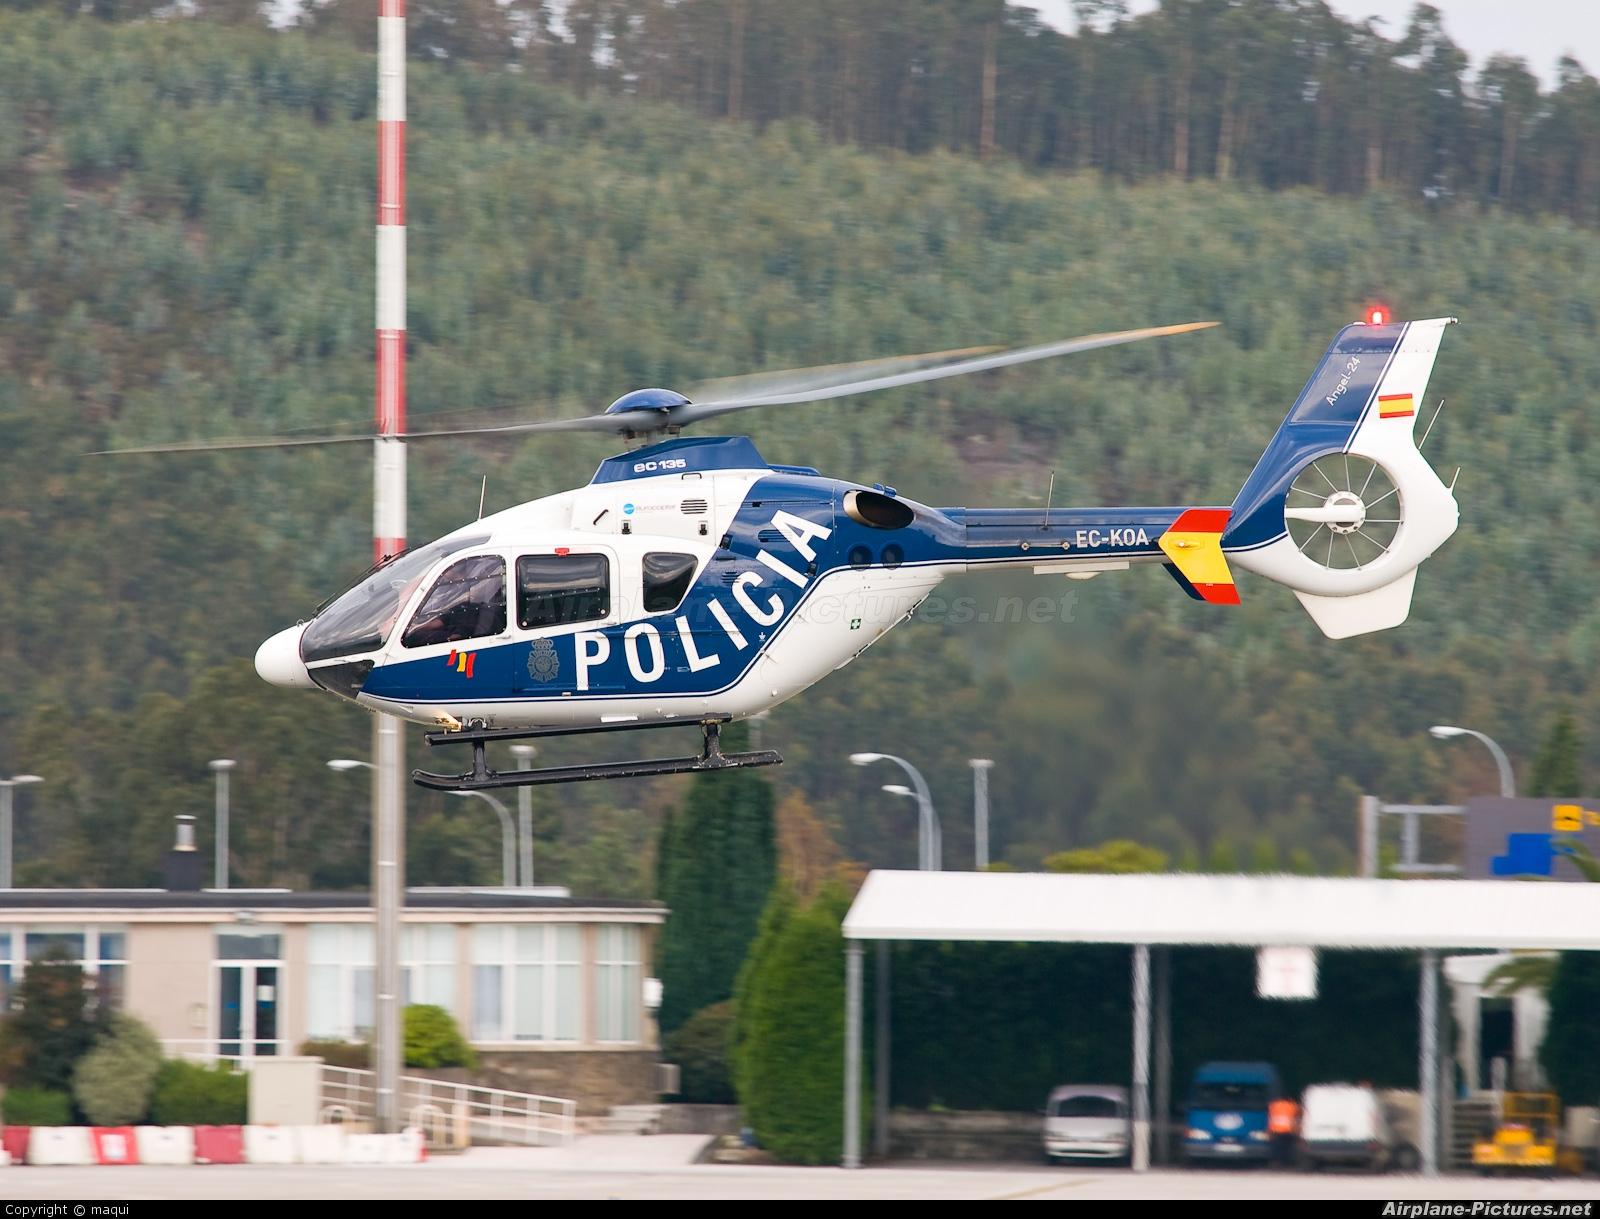 Spain - Police EC-KOA aircraft at La Coruña